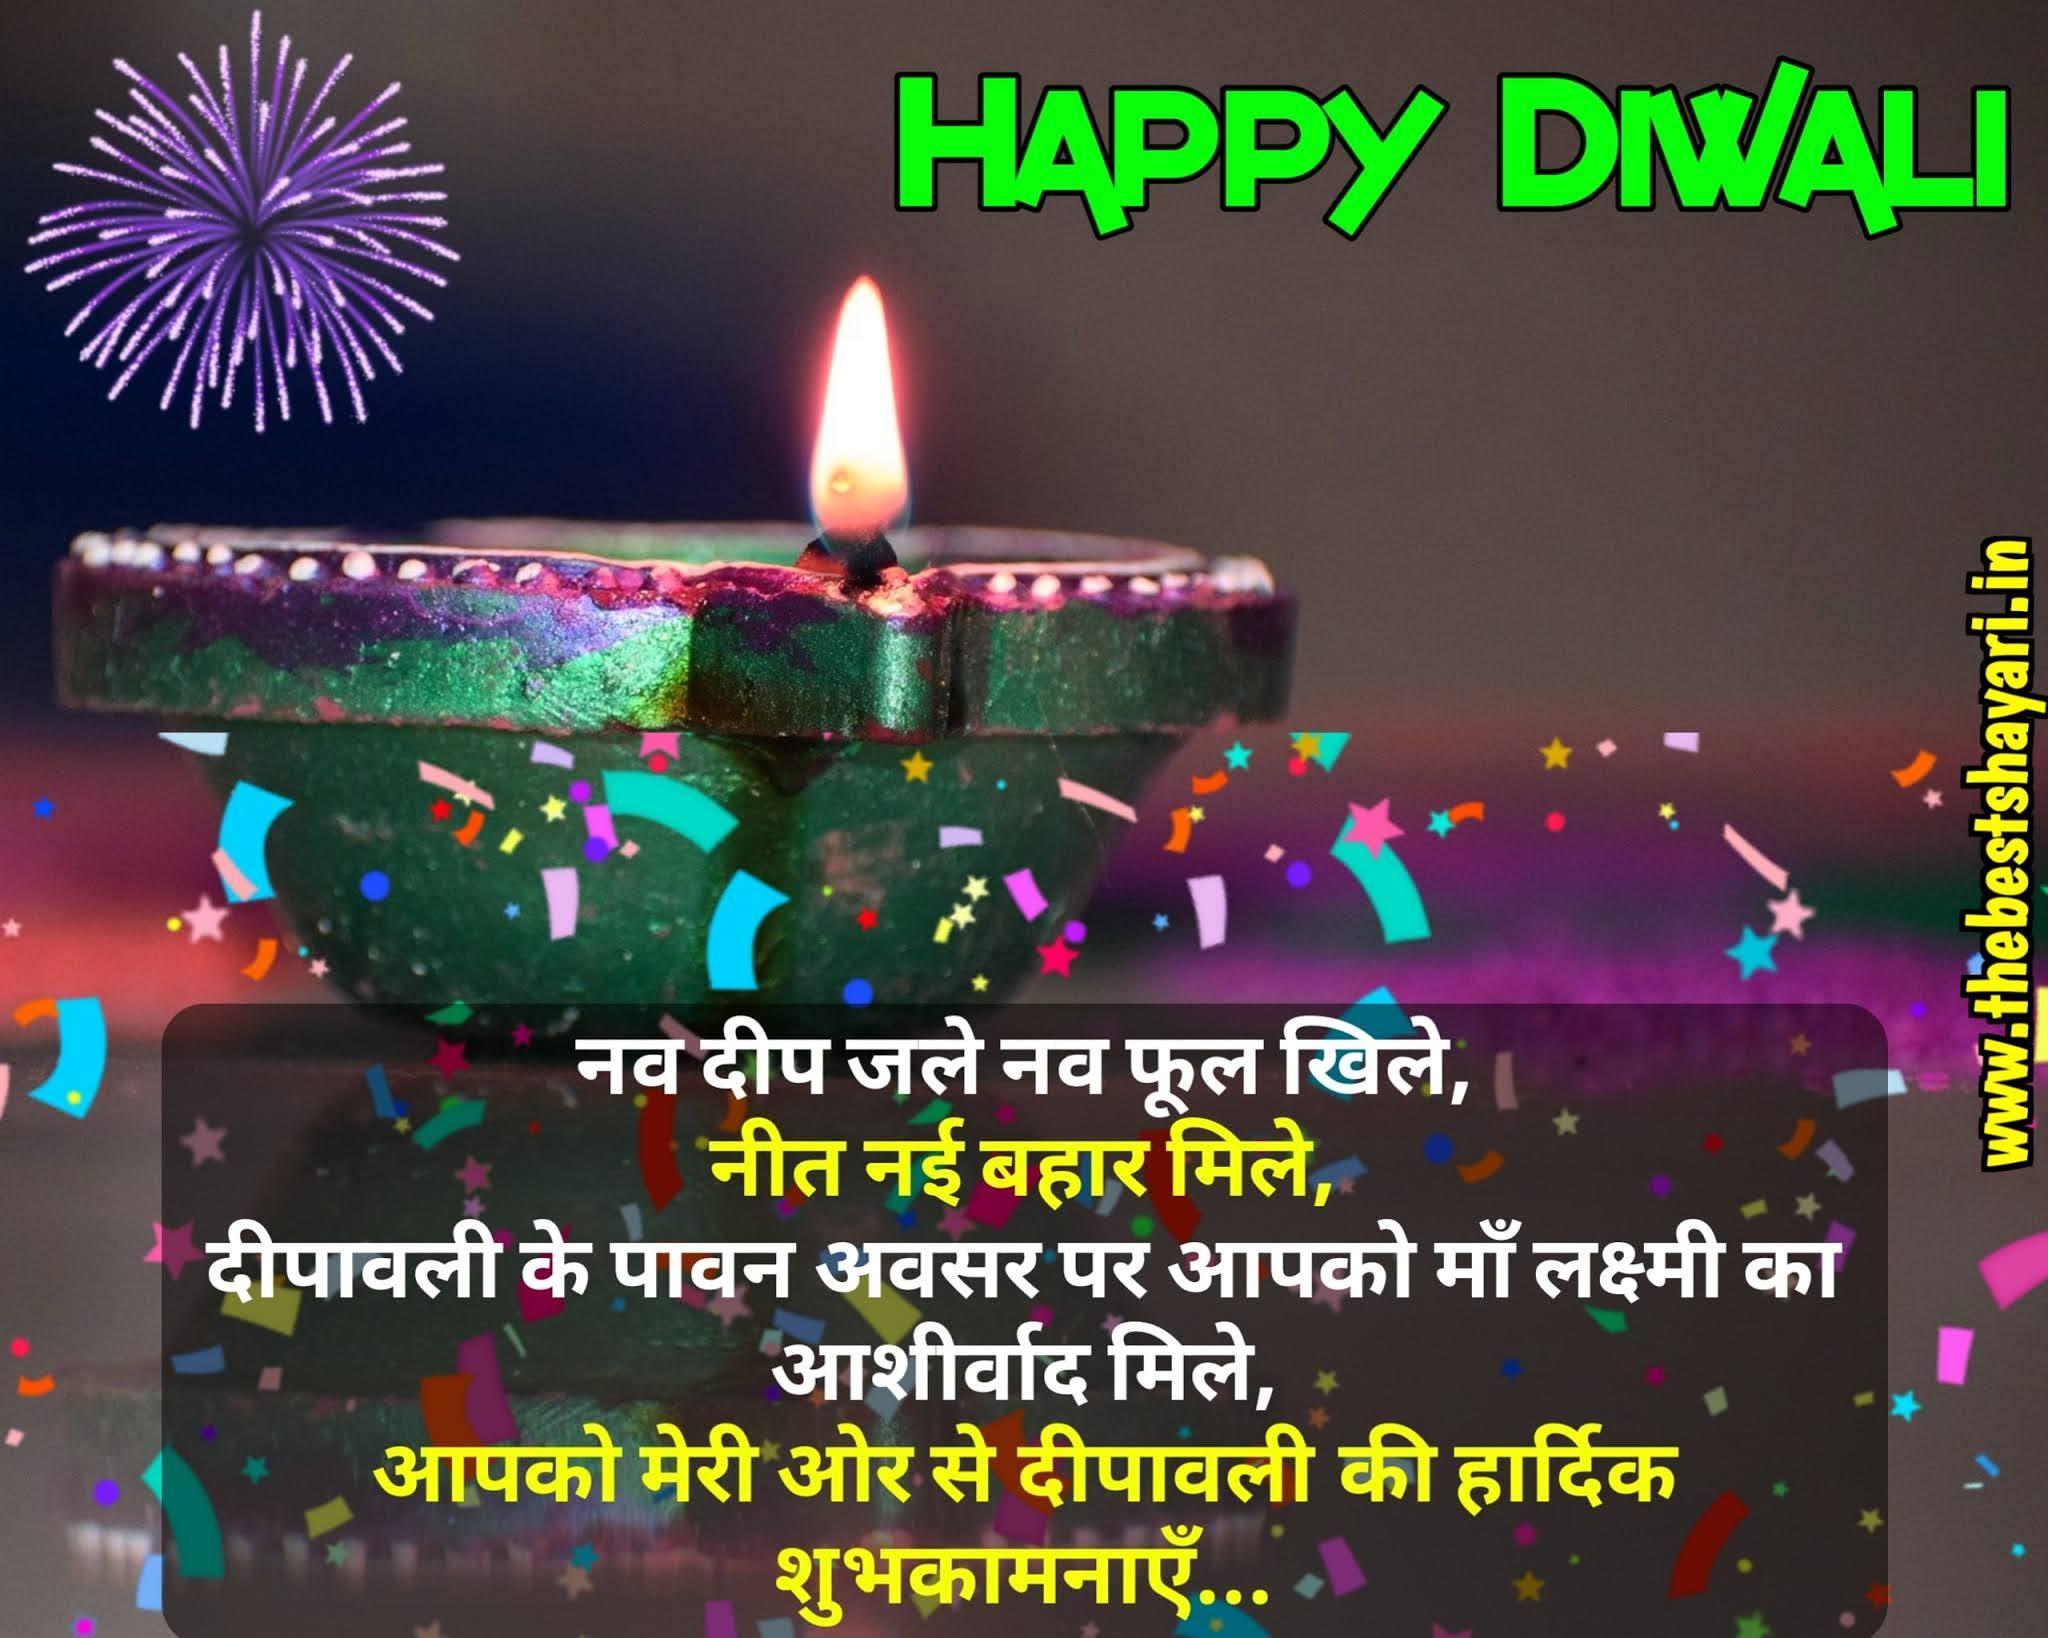 wishes of Diwali